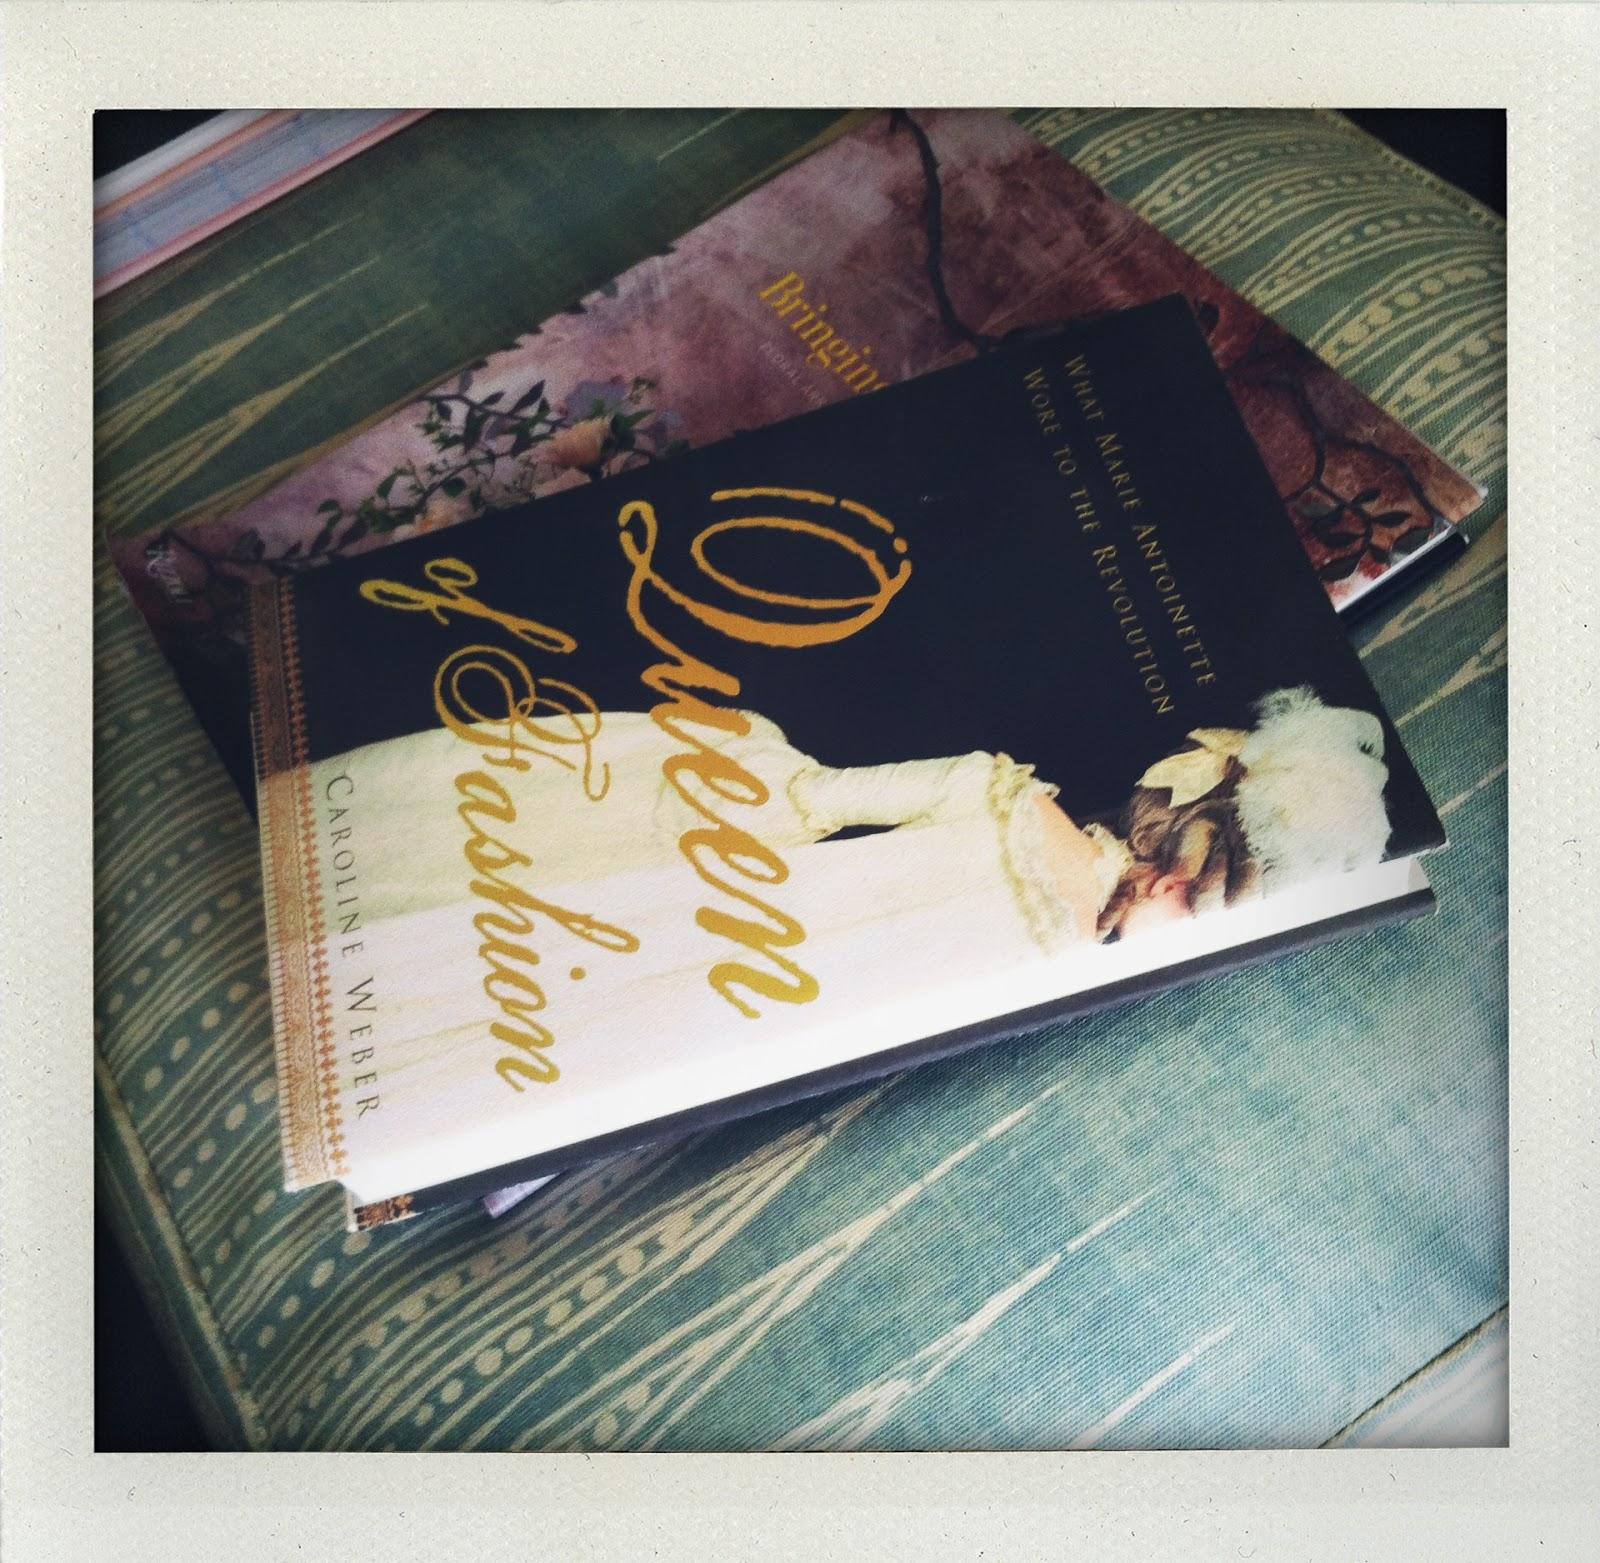 Julie Leah Una vida - I m blog Etiquetas Barbie Girl, en un mundo de Barbie (Jonathan Adler Edition) (Jonathan Adler Edition)